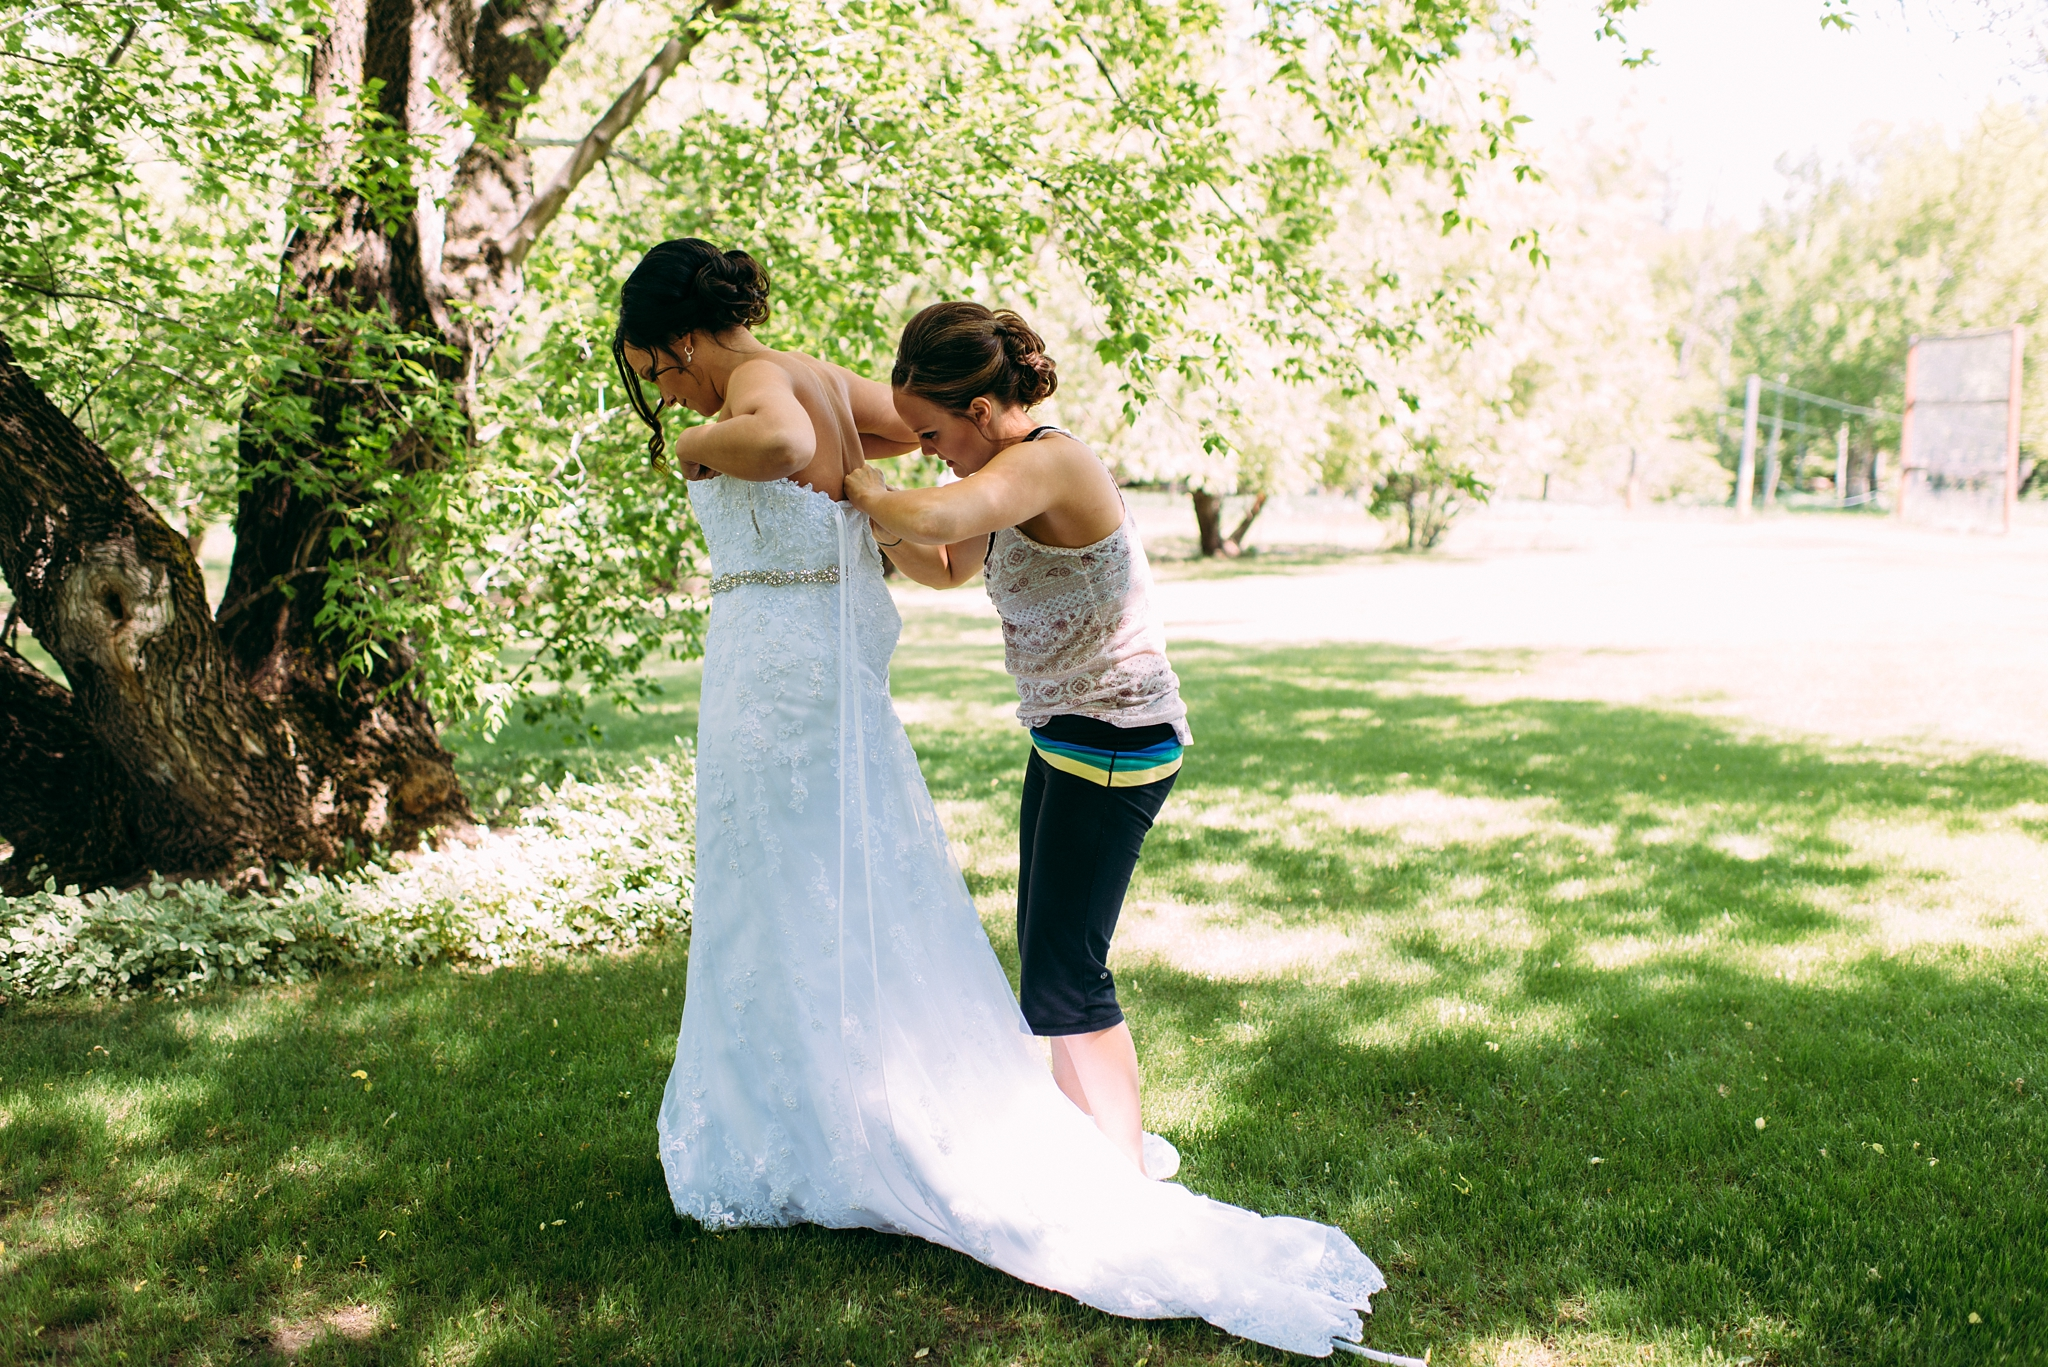 kaihla_tonai_intimate_wedding_elopement_photographer_1505